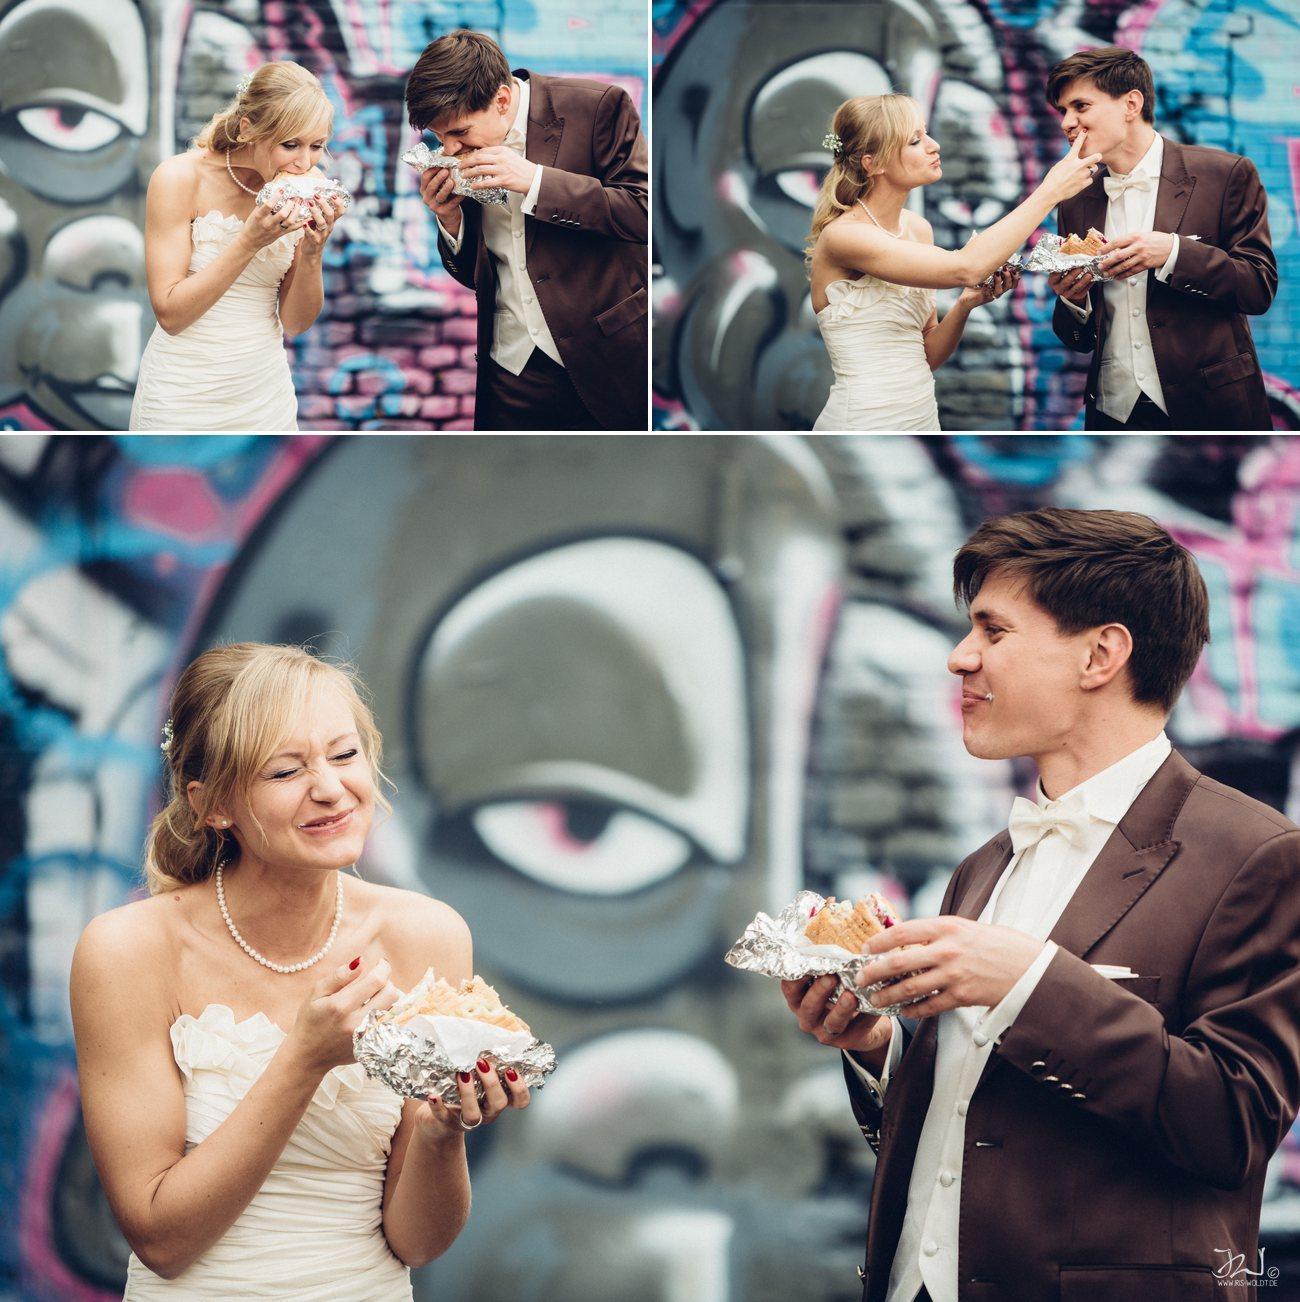 Hochzeitsfotograf_Fabrik23_Berlin 36